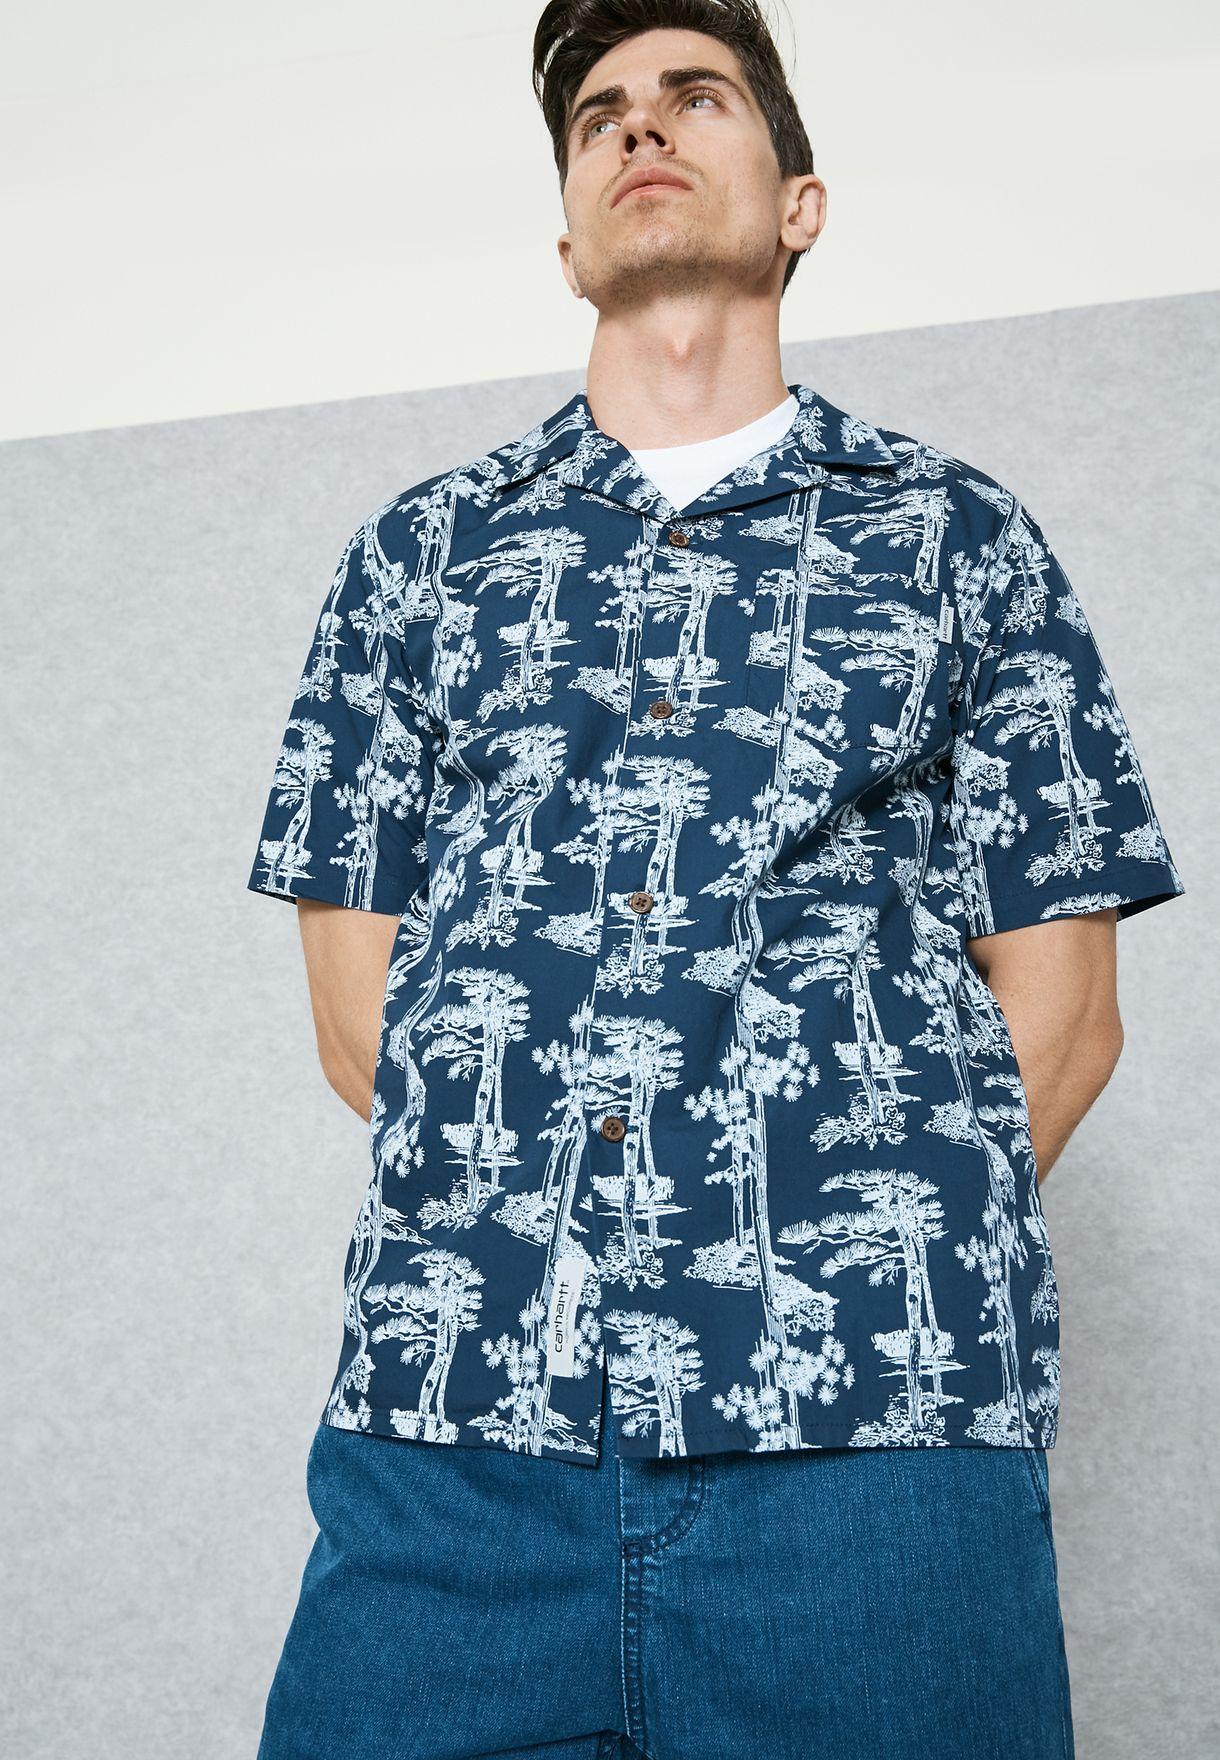 a3e99127 Shop Carhartt WIP prints Pine Hawaii Shirt I022943 for Men in ...